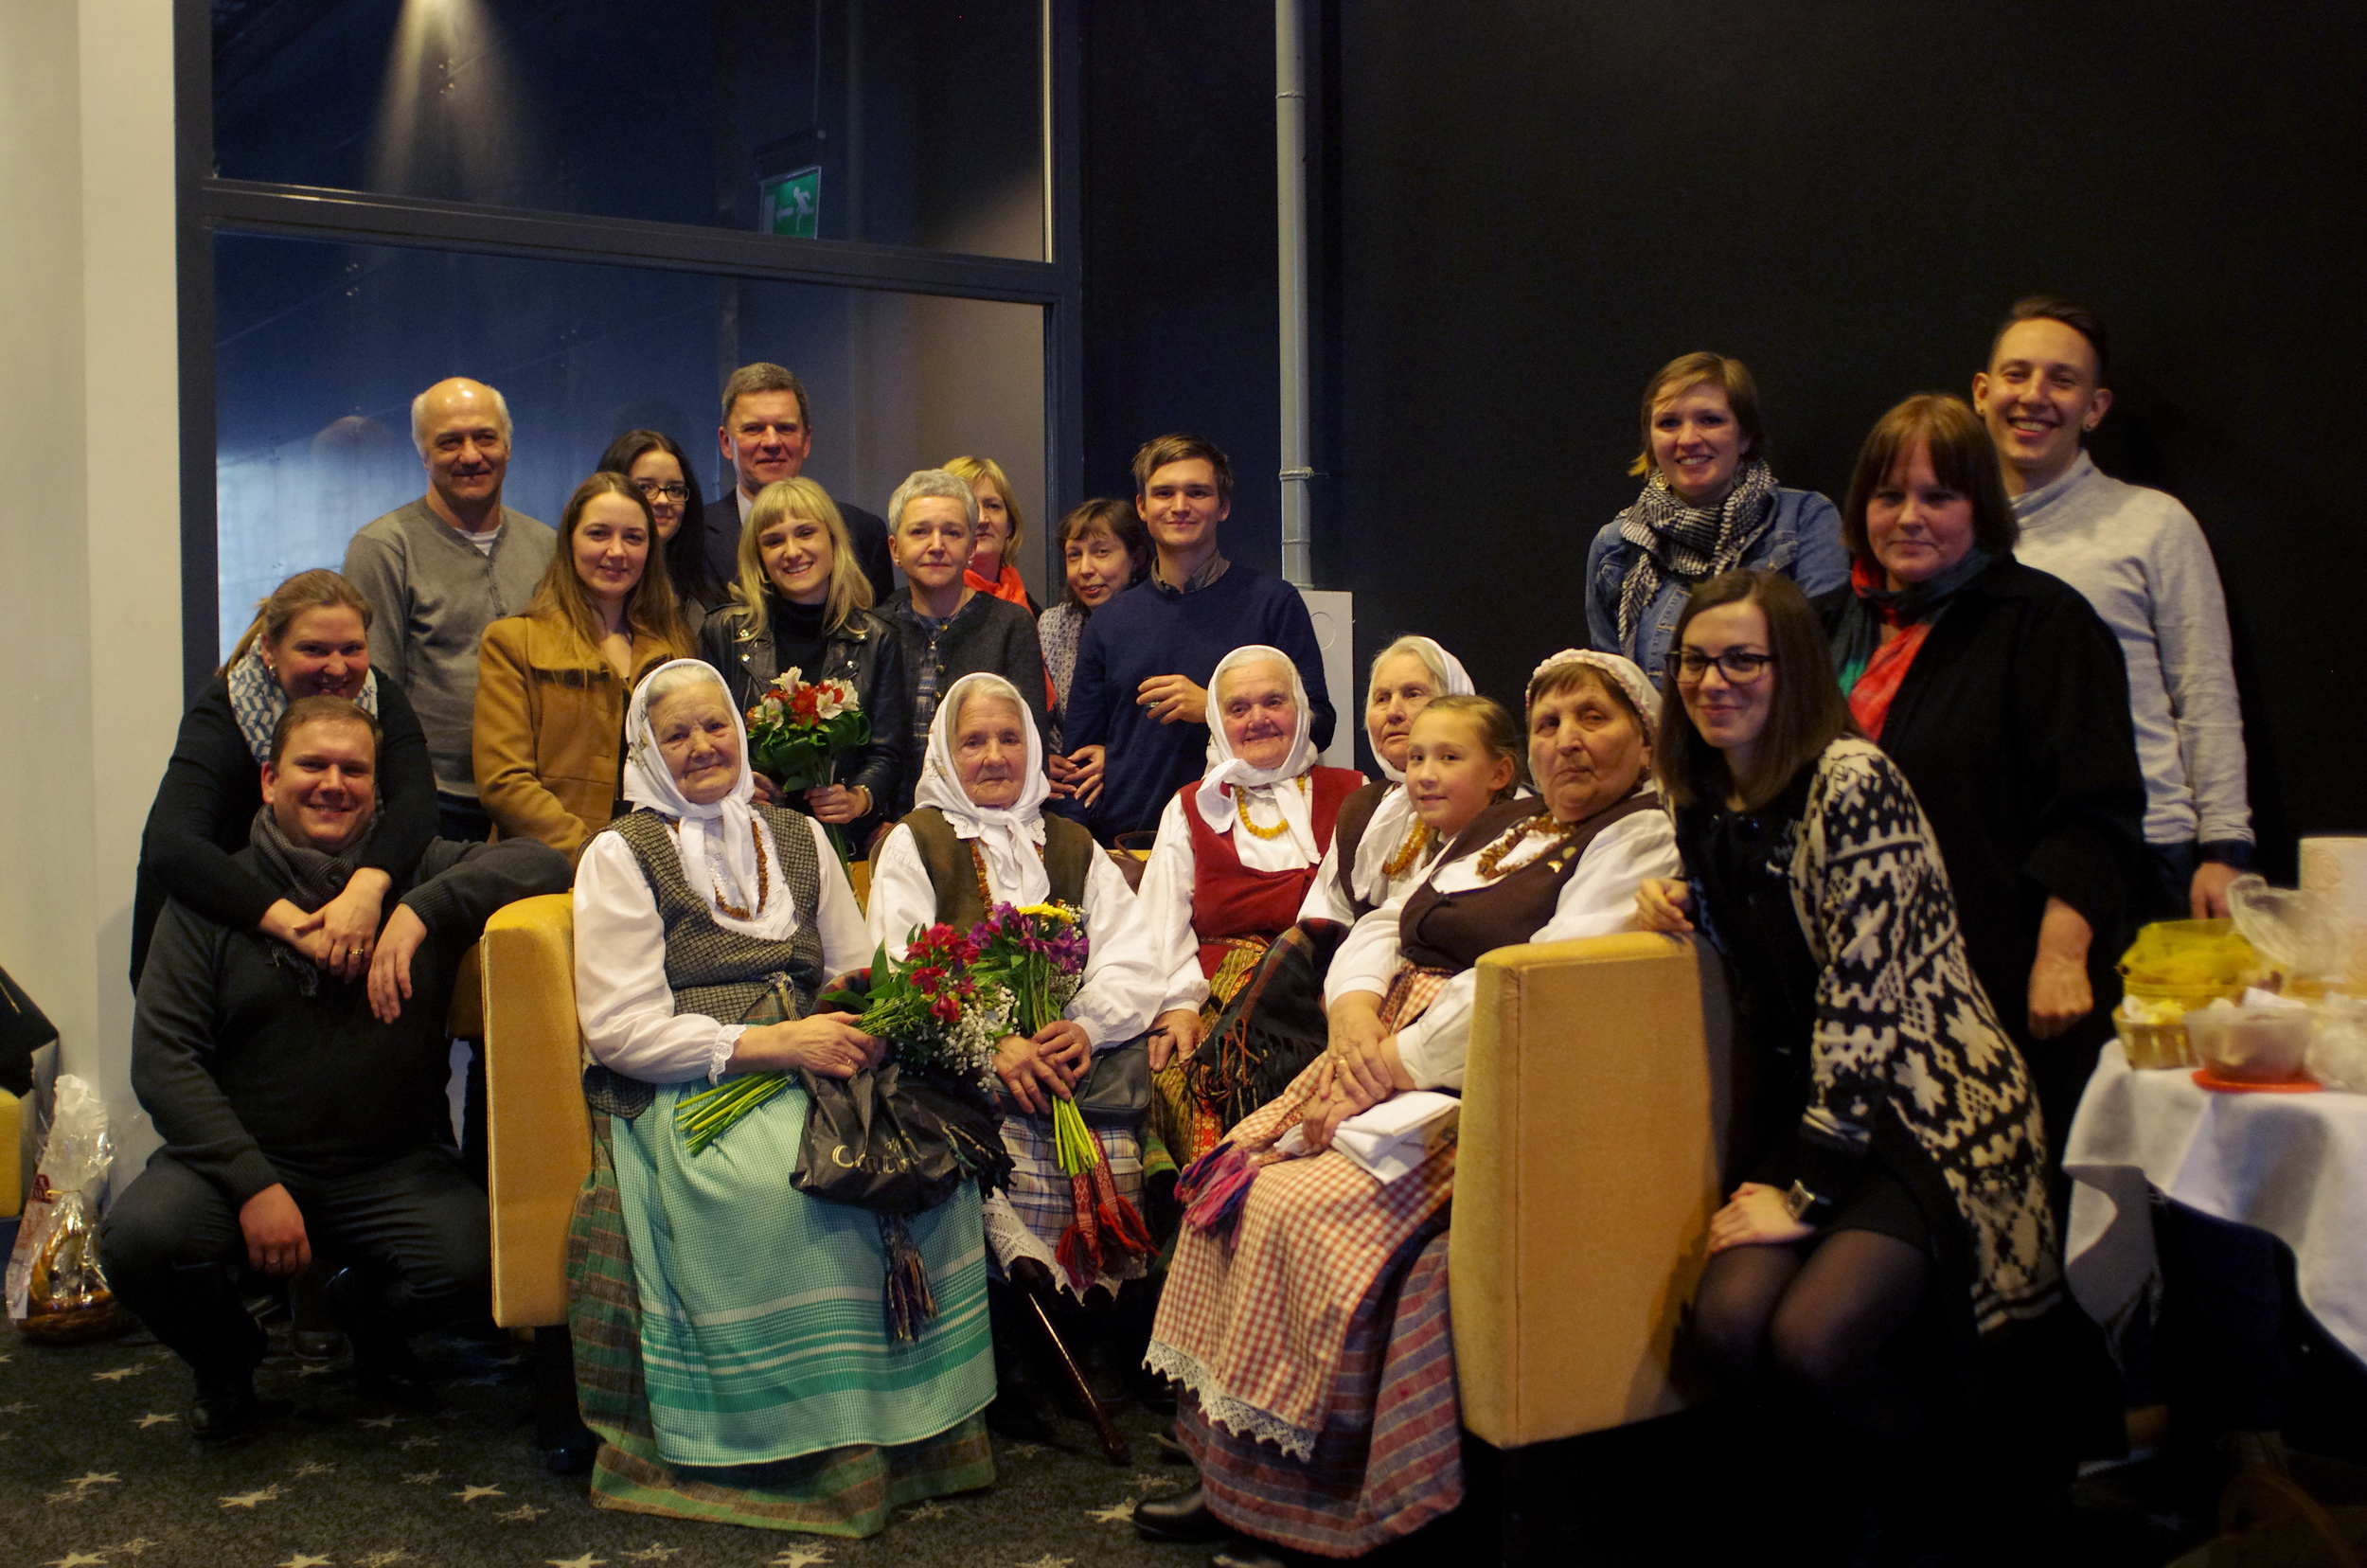 World Premiere at the Vilnius International Film Festival in Vilnius, Lithuania (March 2015).